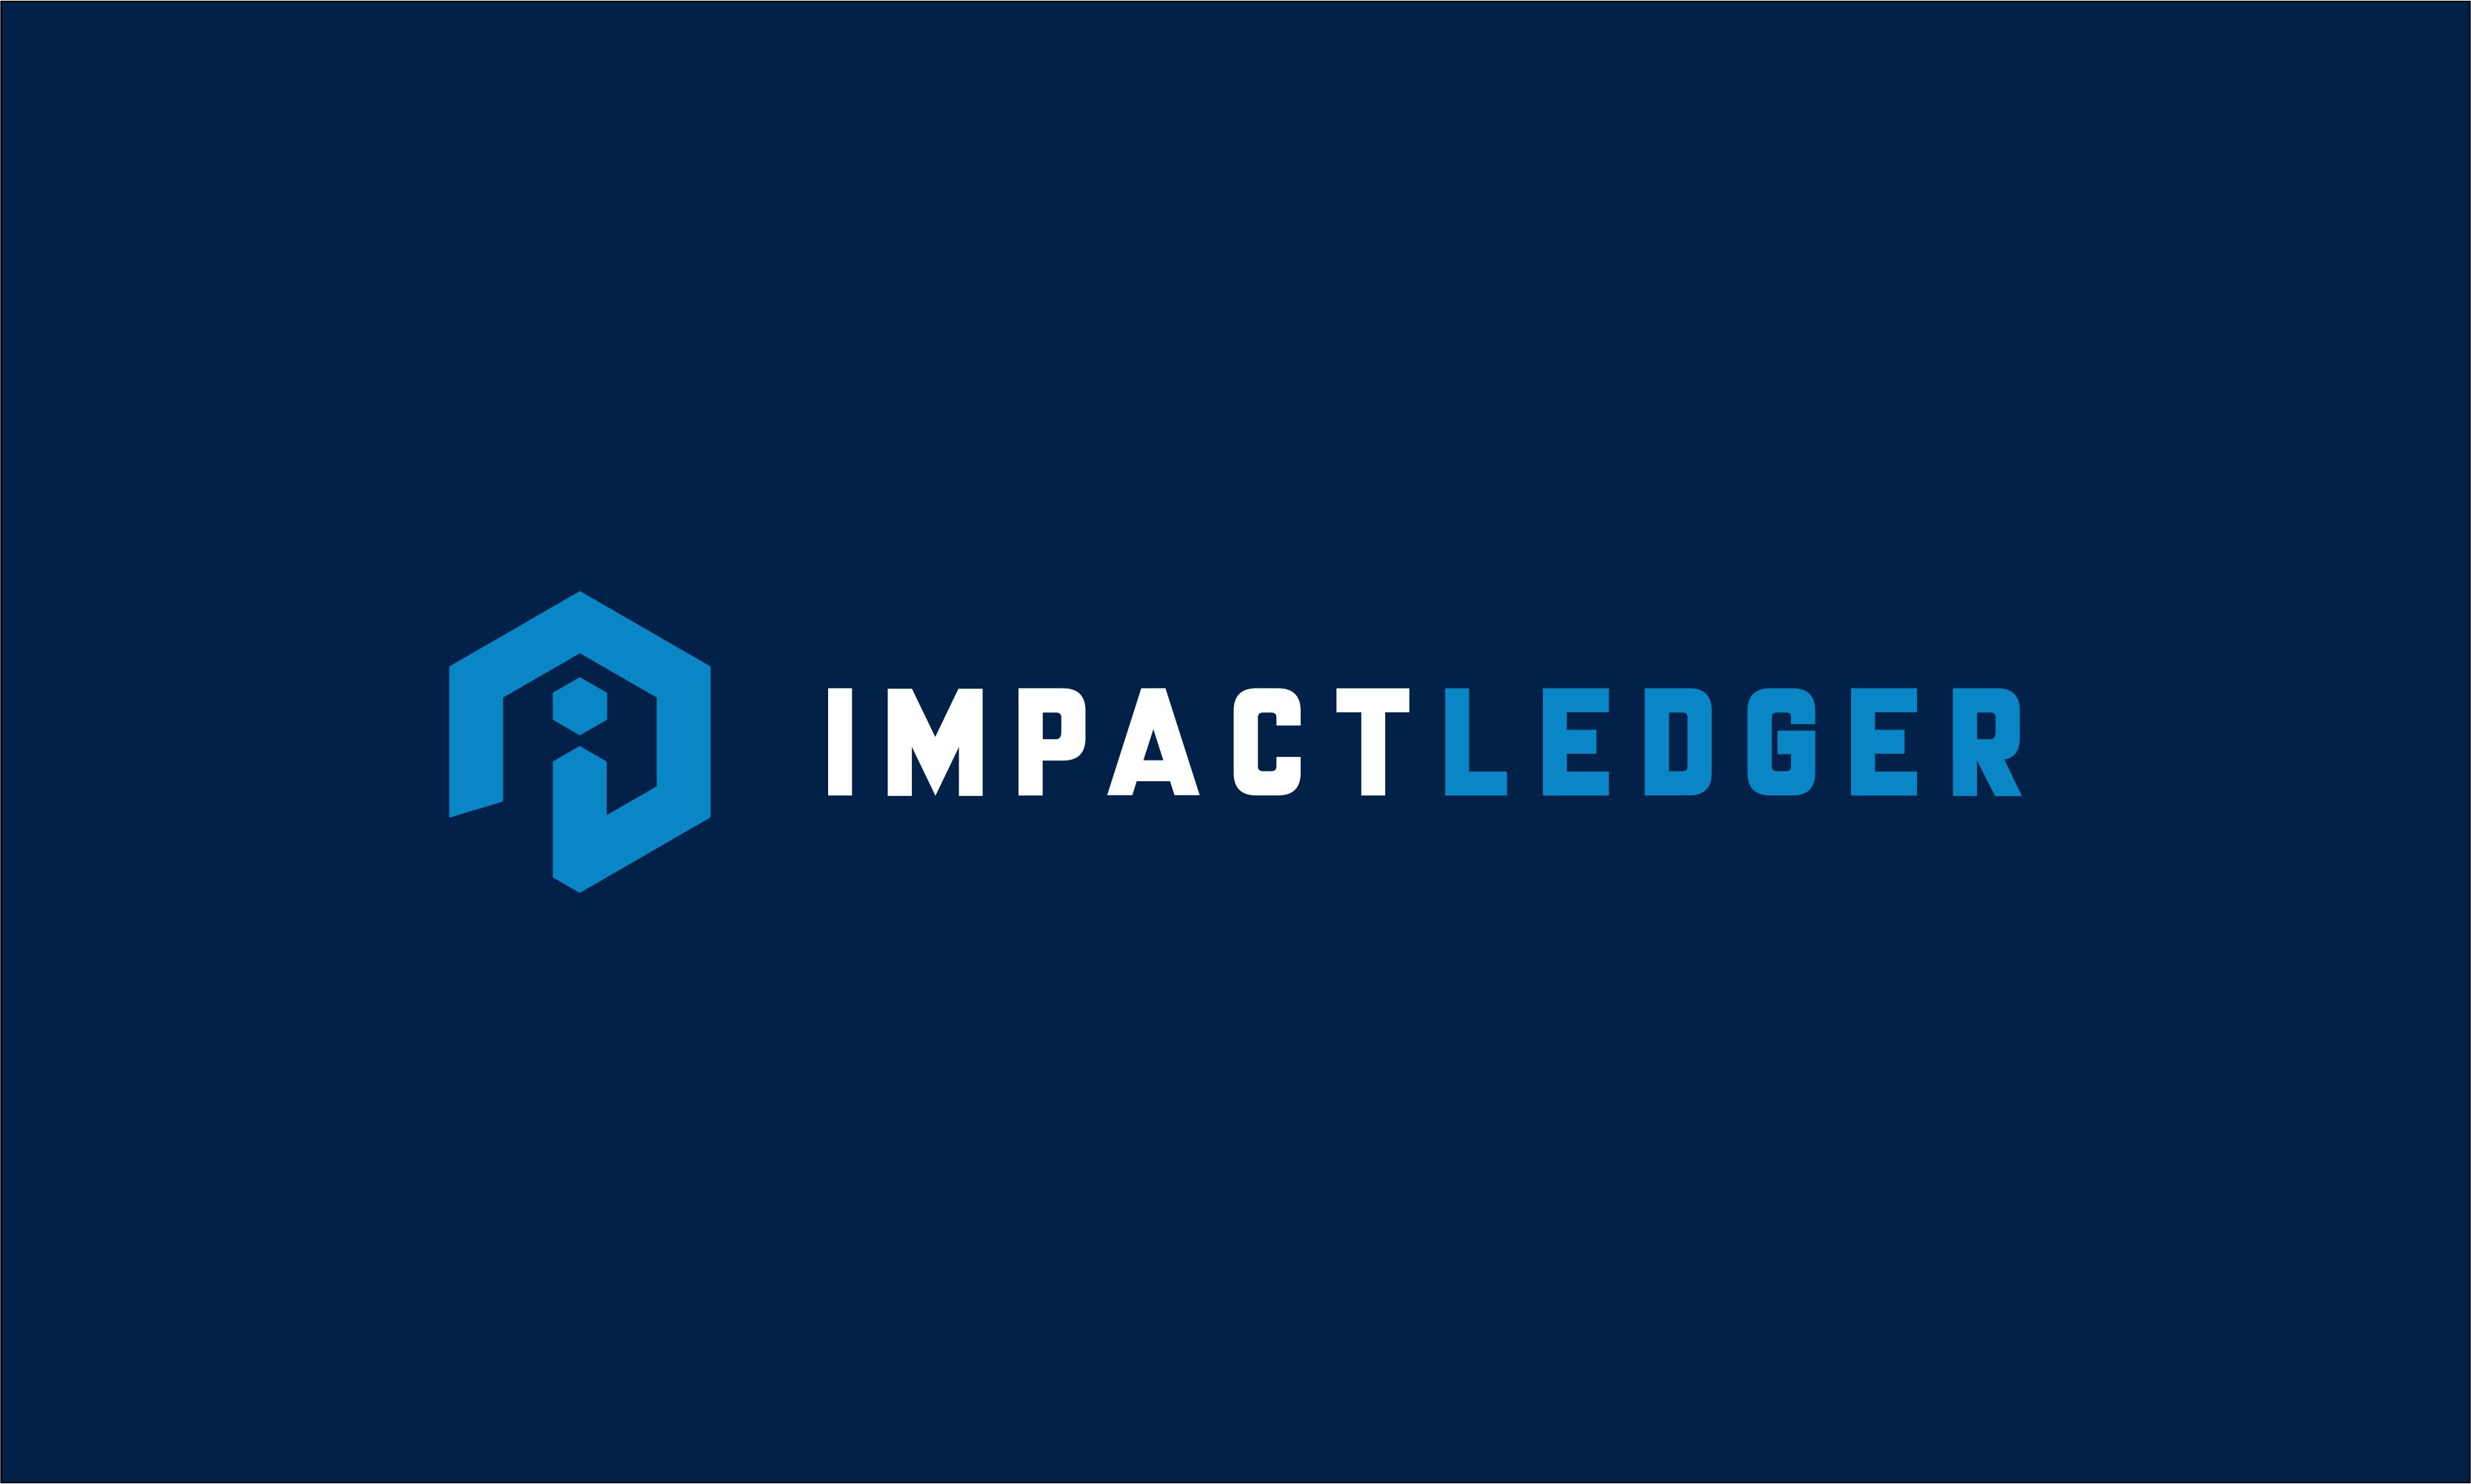 Impactledger